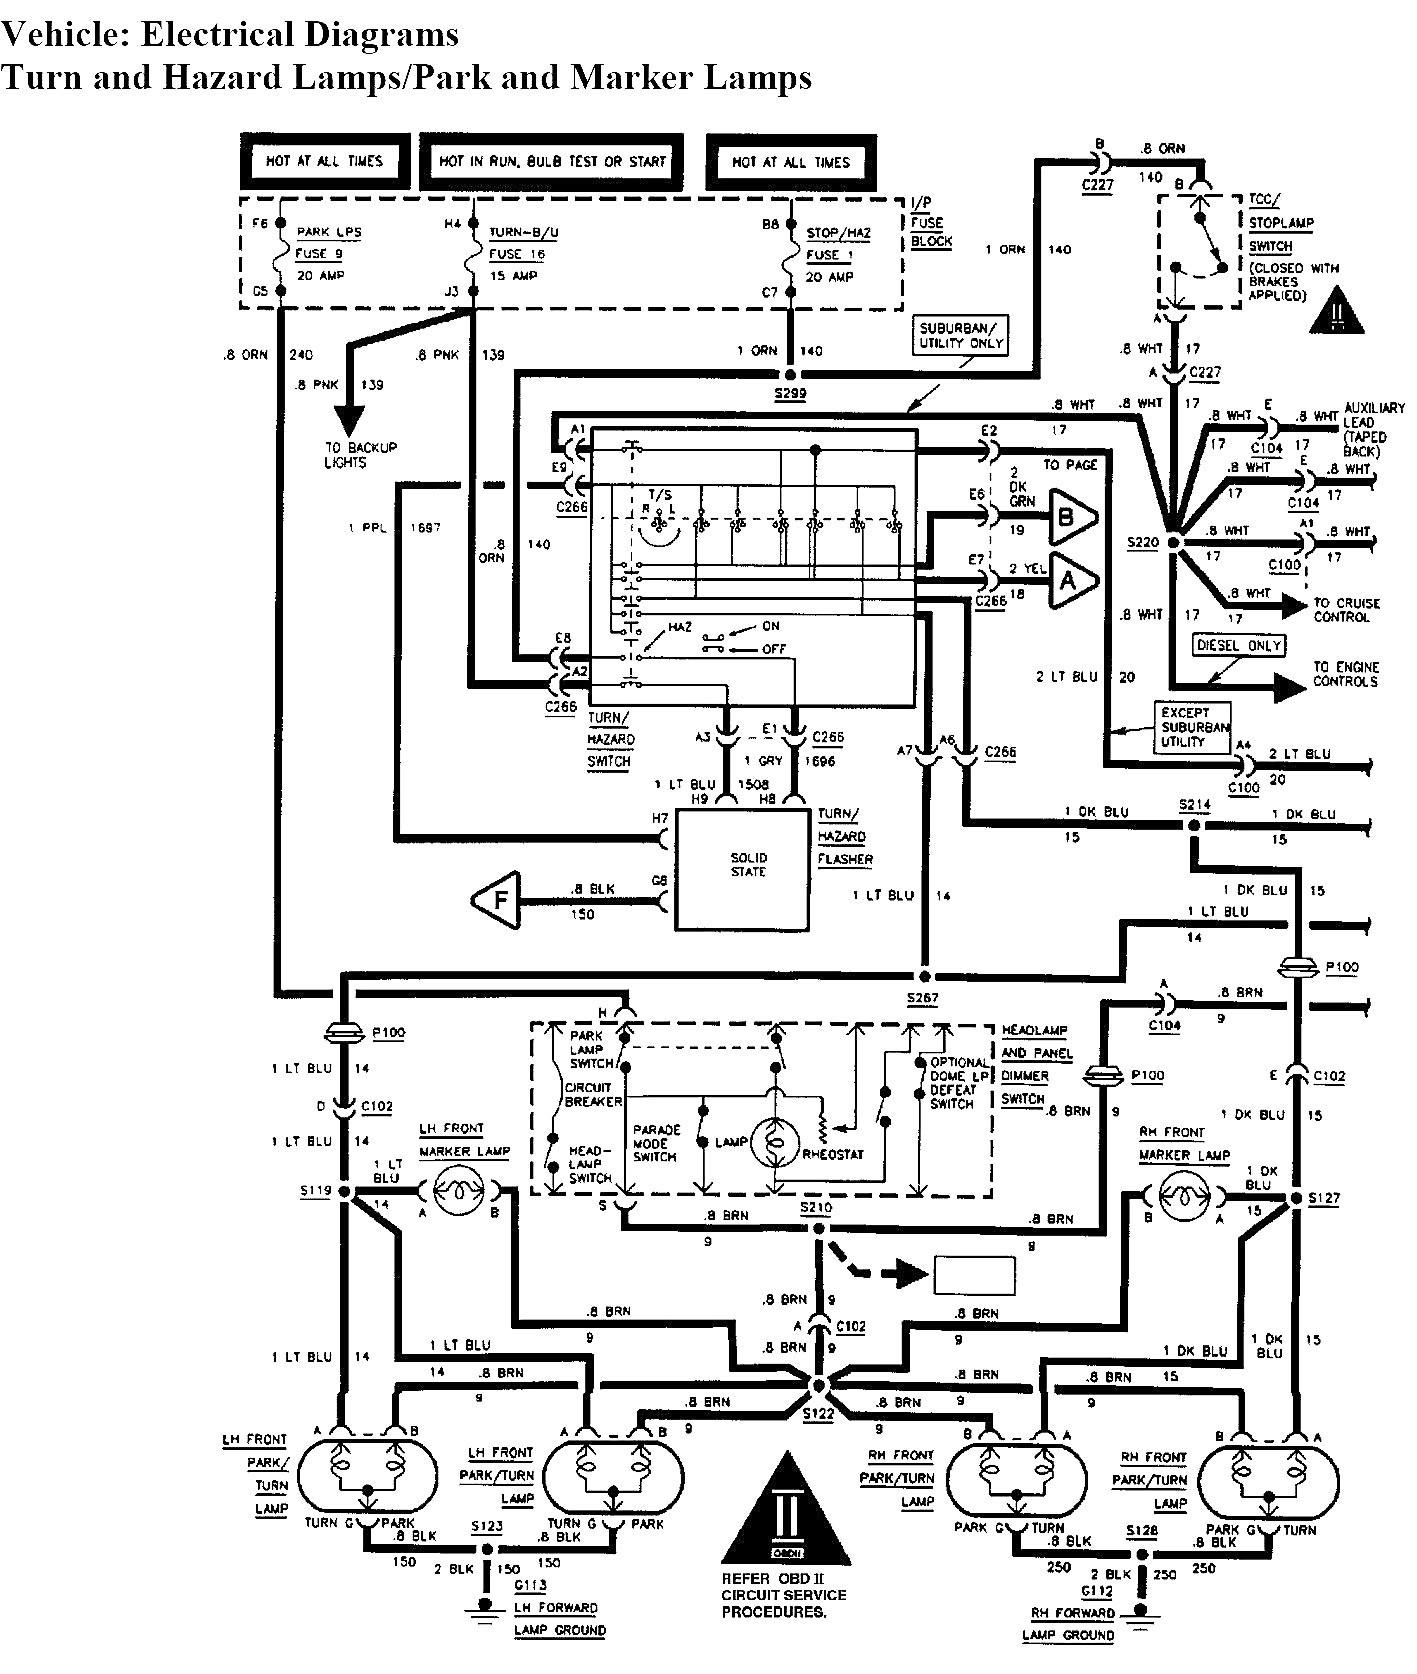 2006 Chevy Silverado Tail Light Wiring Diagram Sterling